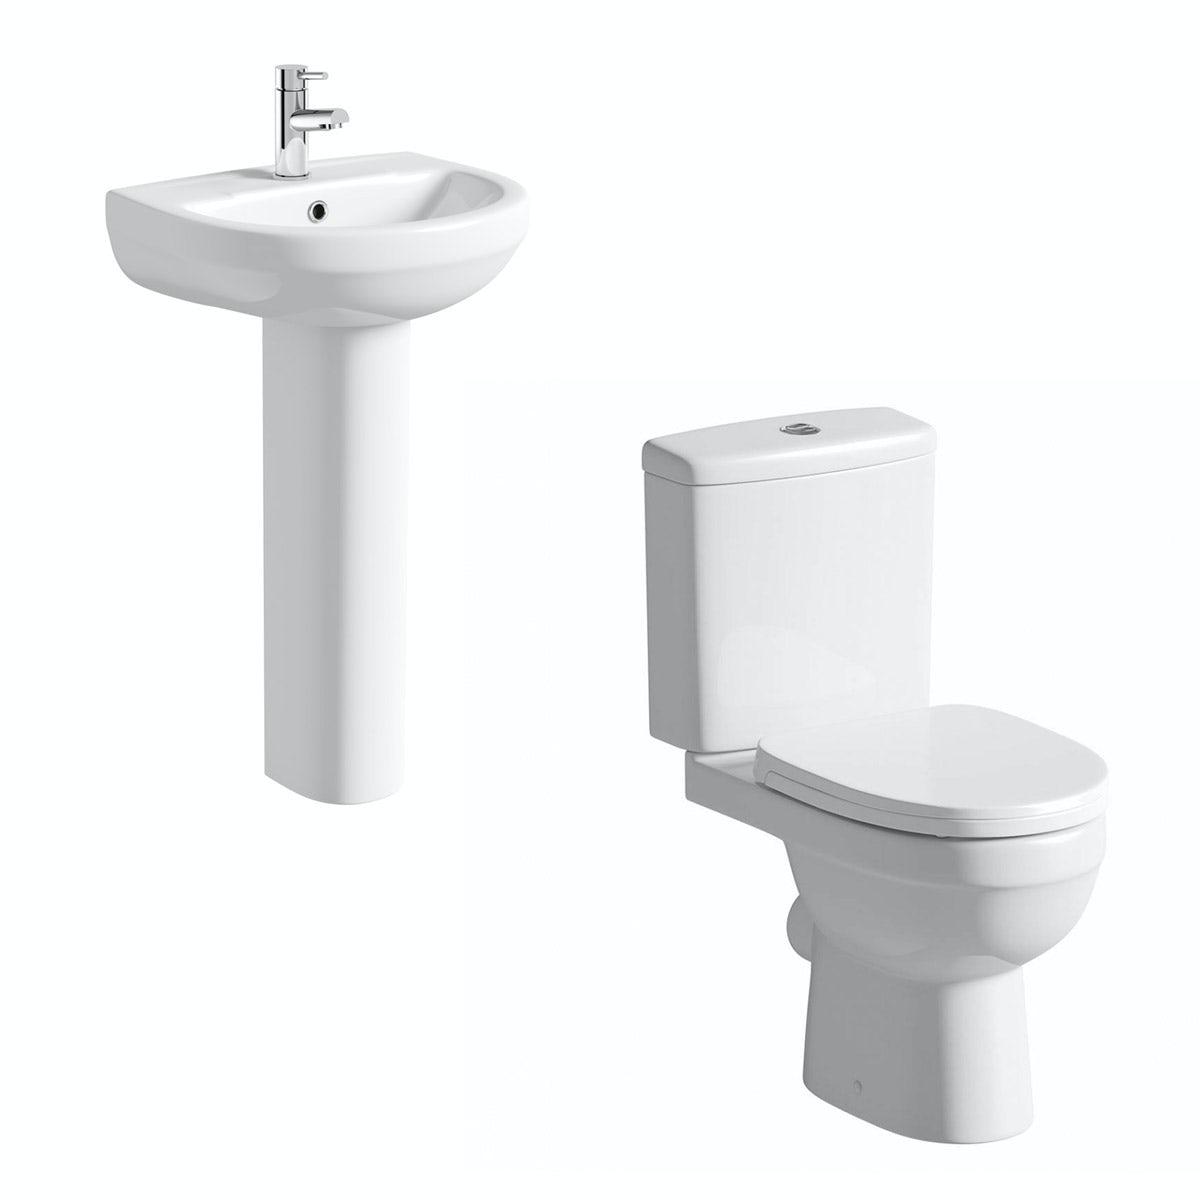 Orchard Eden cloakroom suite with full pedestal basin 550mm